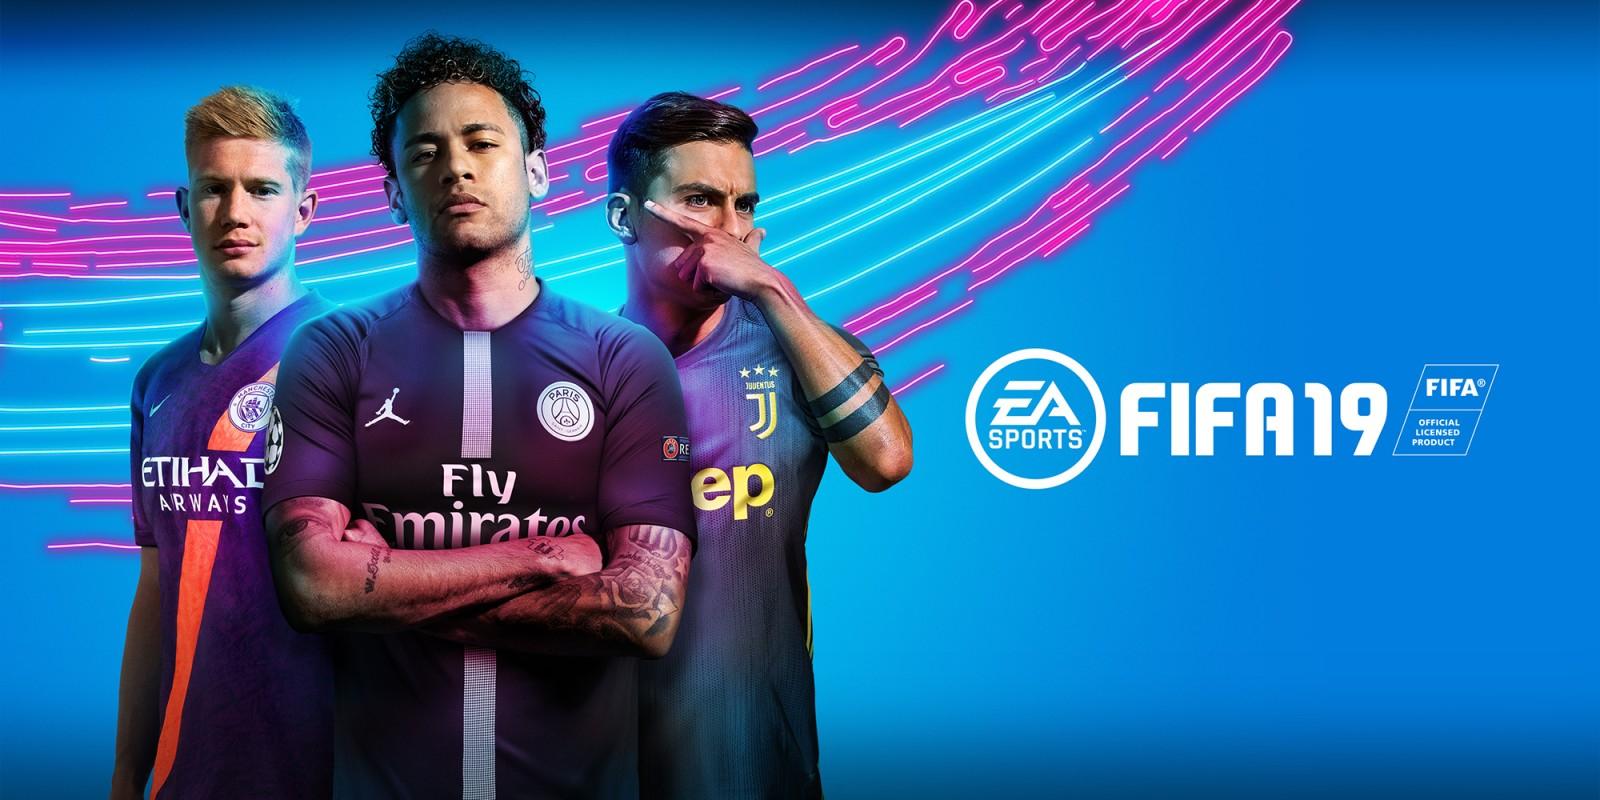 Fifa 19 Switch 19,79 in nintendo e-shop